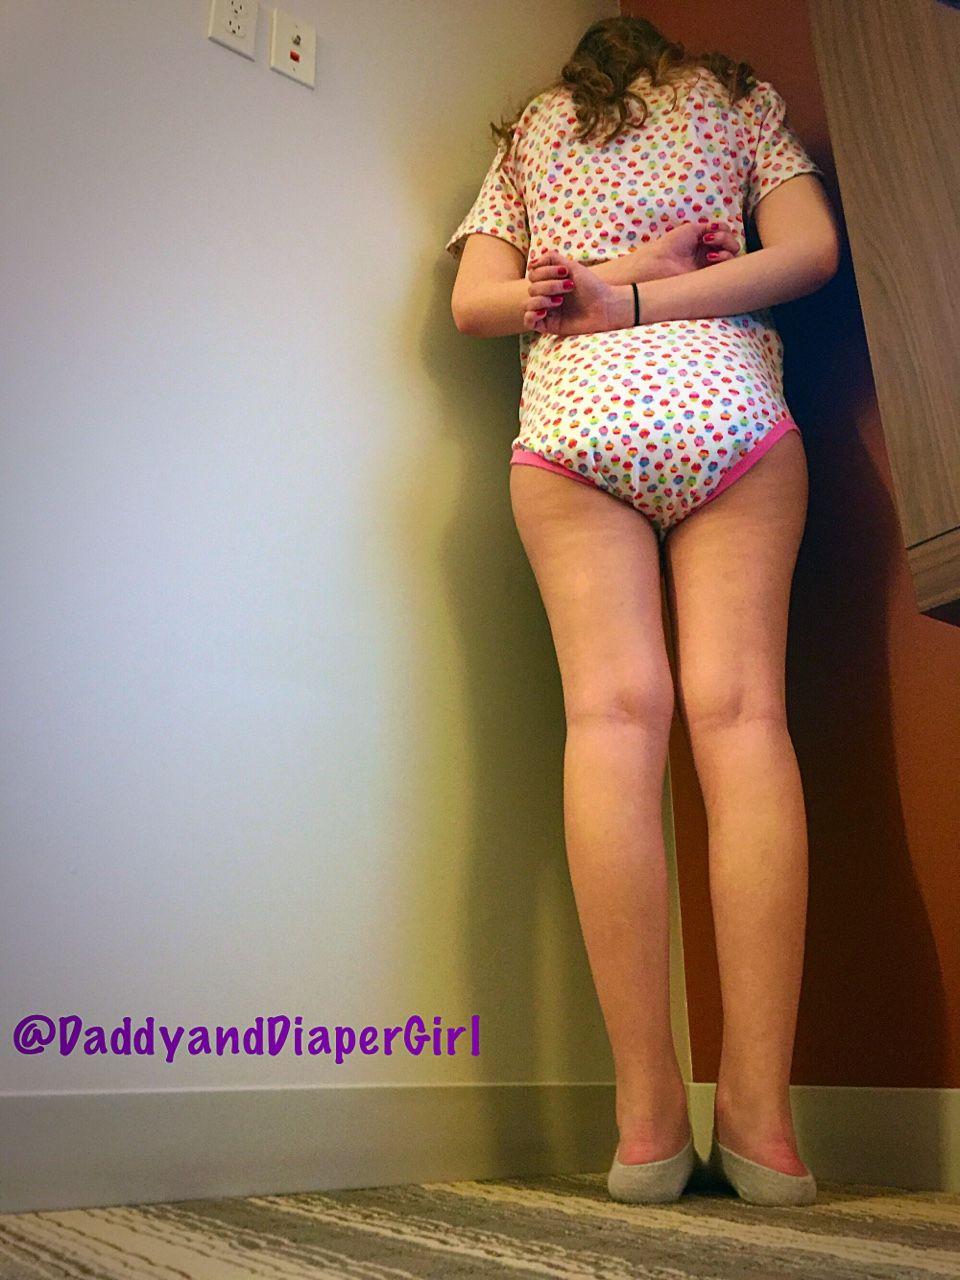 Cute asian ladyboy lingerie